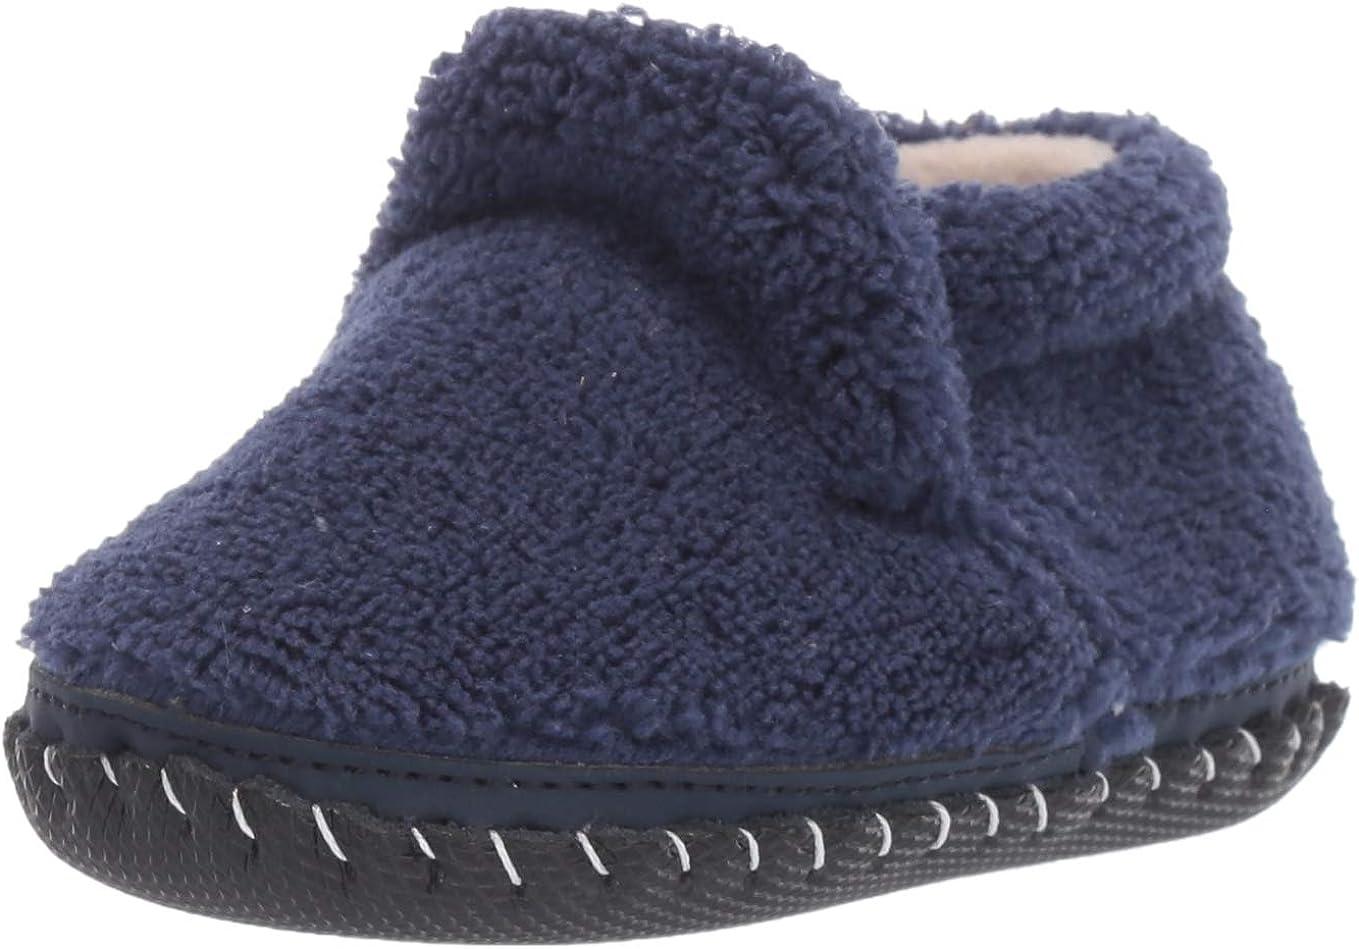 pediped Unisex-Child Boo Crib Shoe